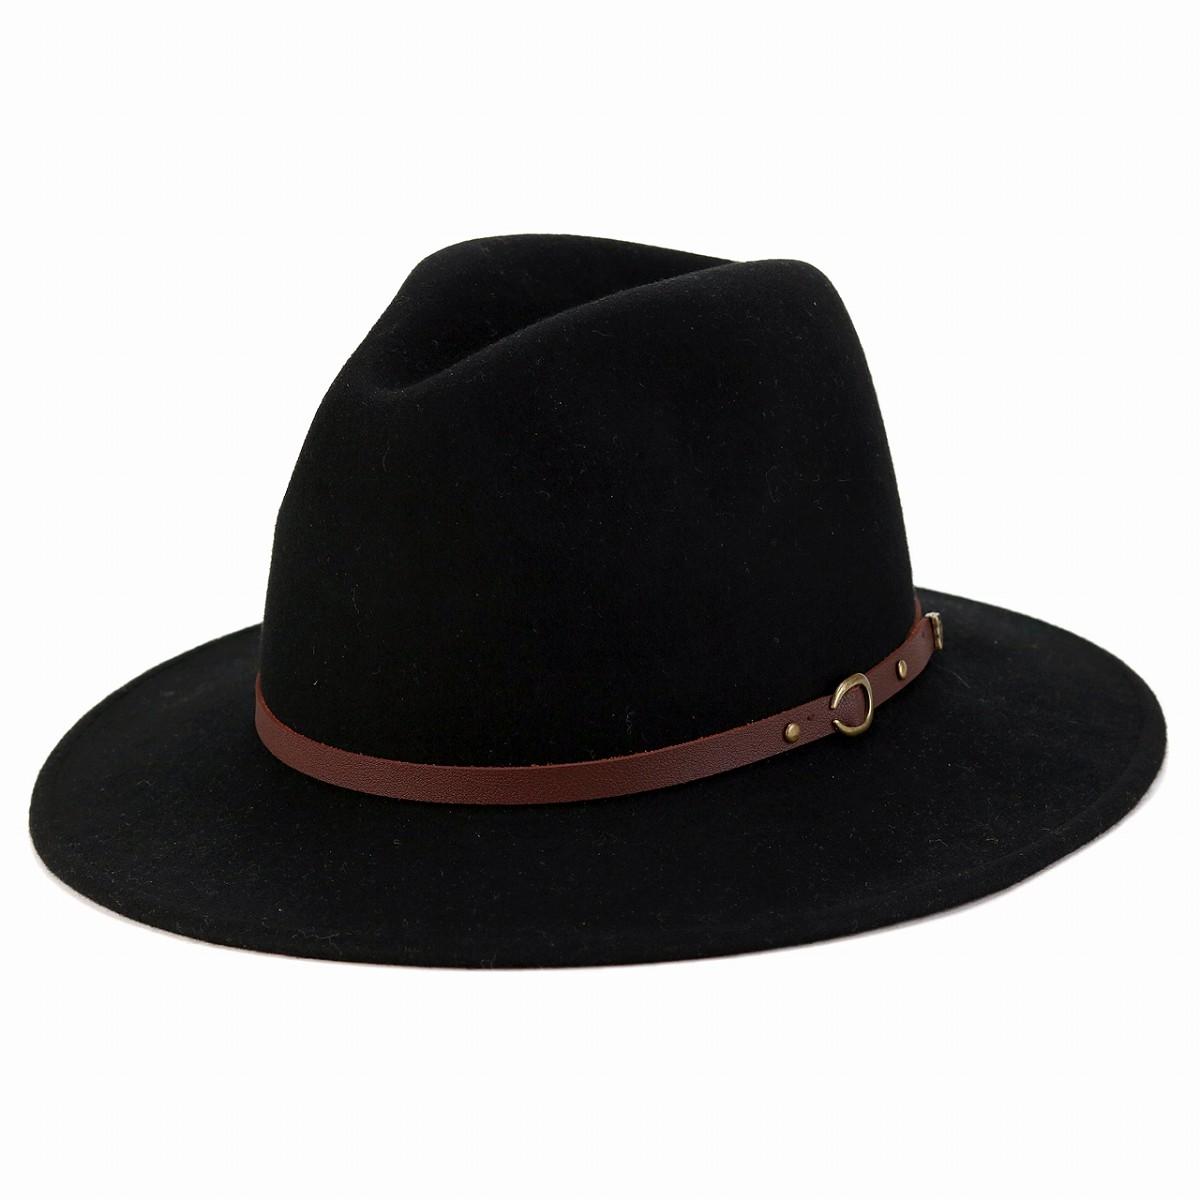 e4ef42b3b8b ELEHELM HAT STORE  Christie s hat men s wide brim Christie s London ...